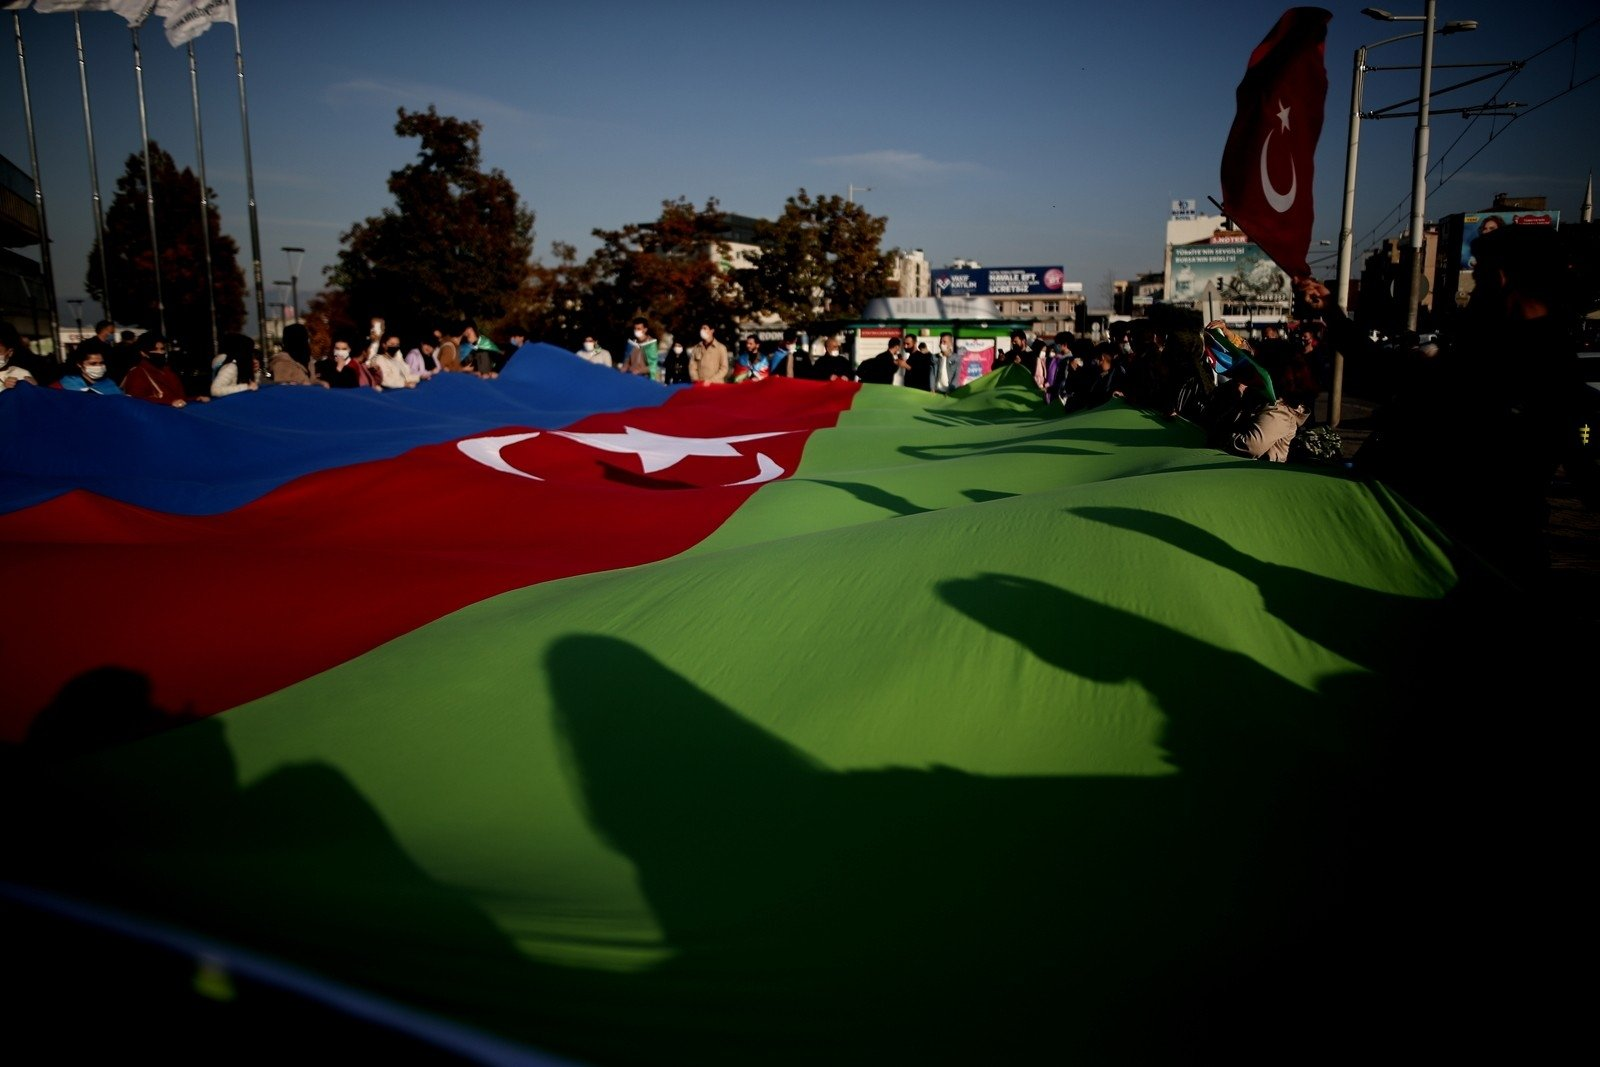 People wave an Azerbaijani flag during a celebration for Azerbaijan's victory against Armenia in the Nagorno-Karabakh region, Nov. 13, 2020. (İHA Photo)